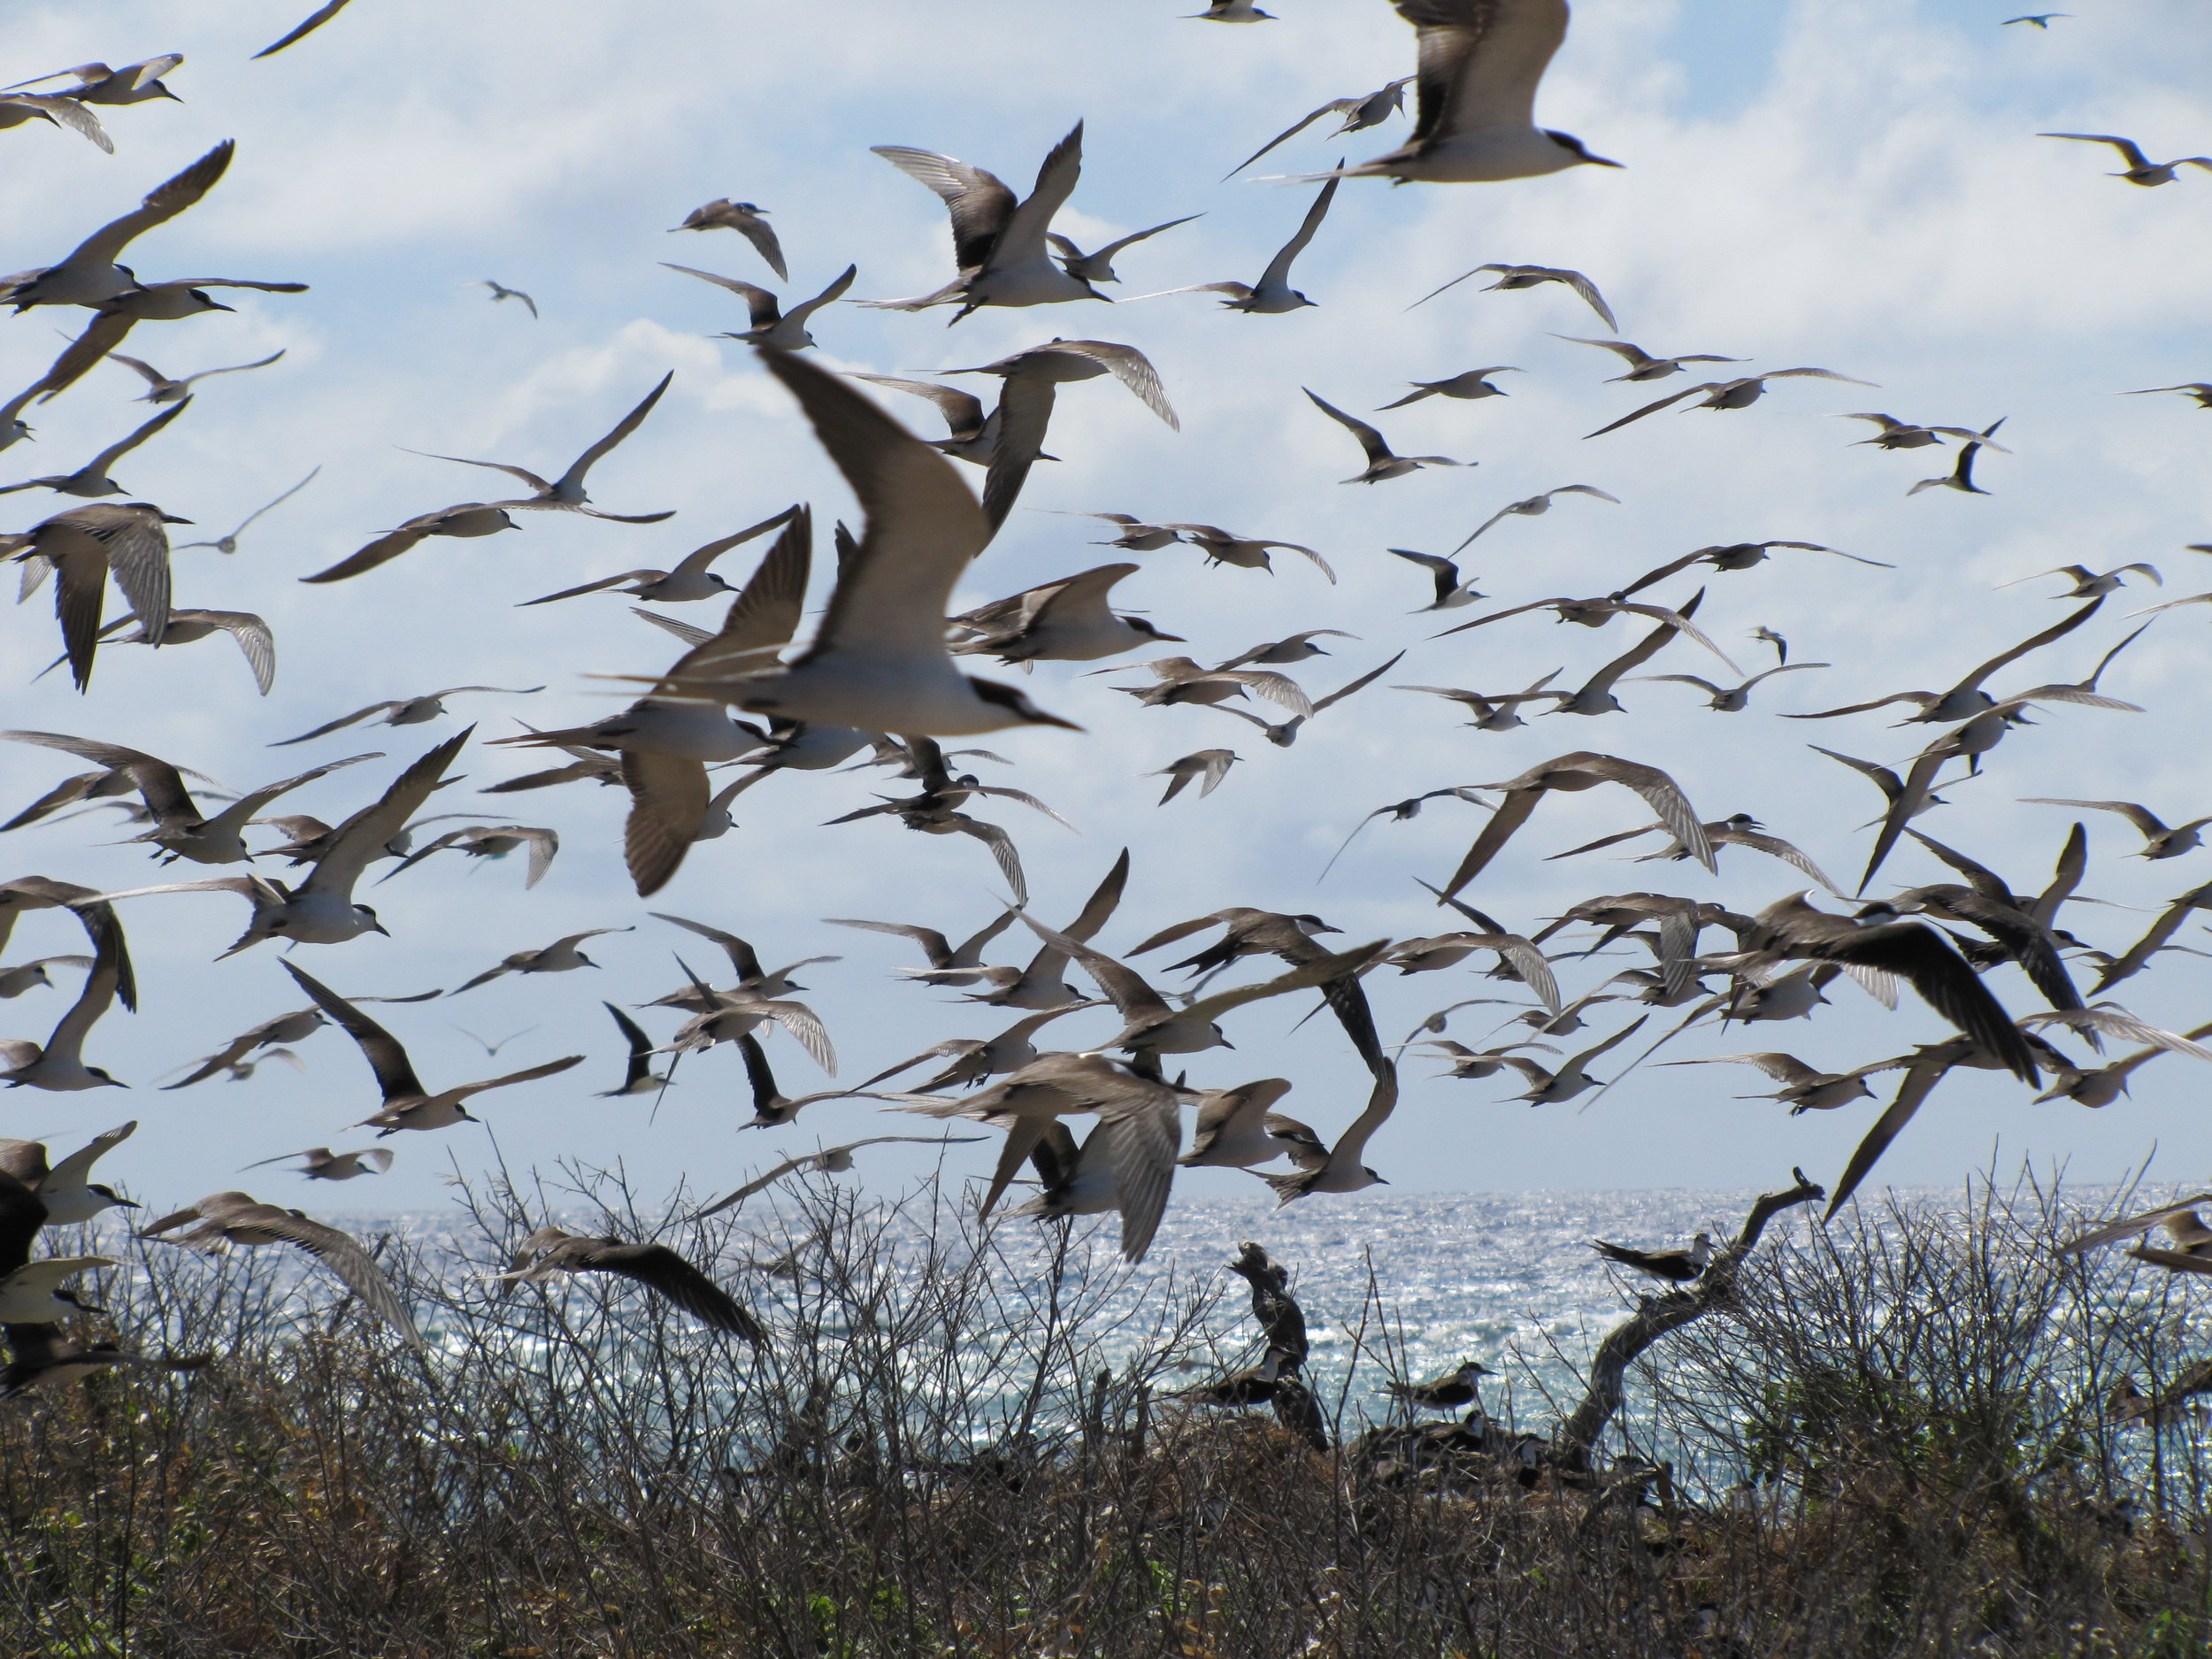 Lots & lots of birds!